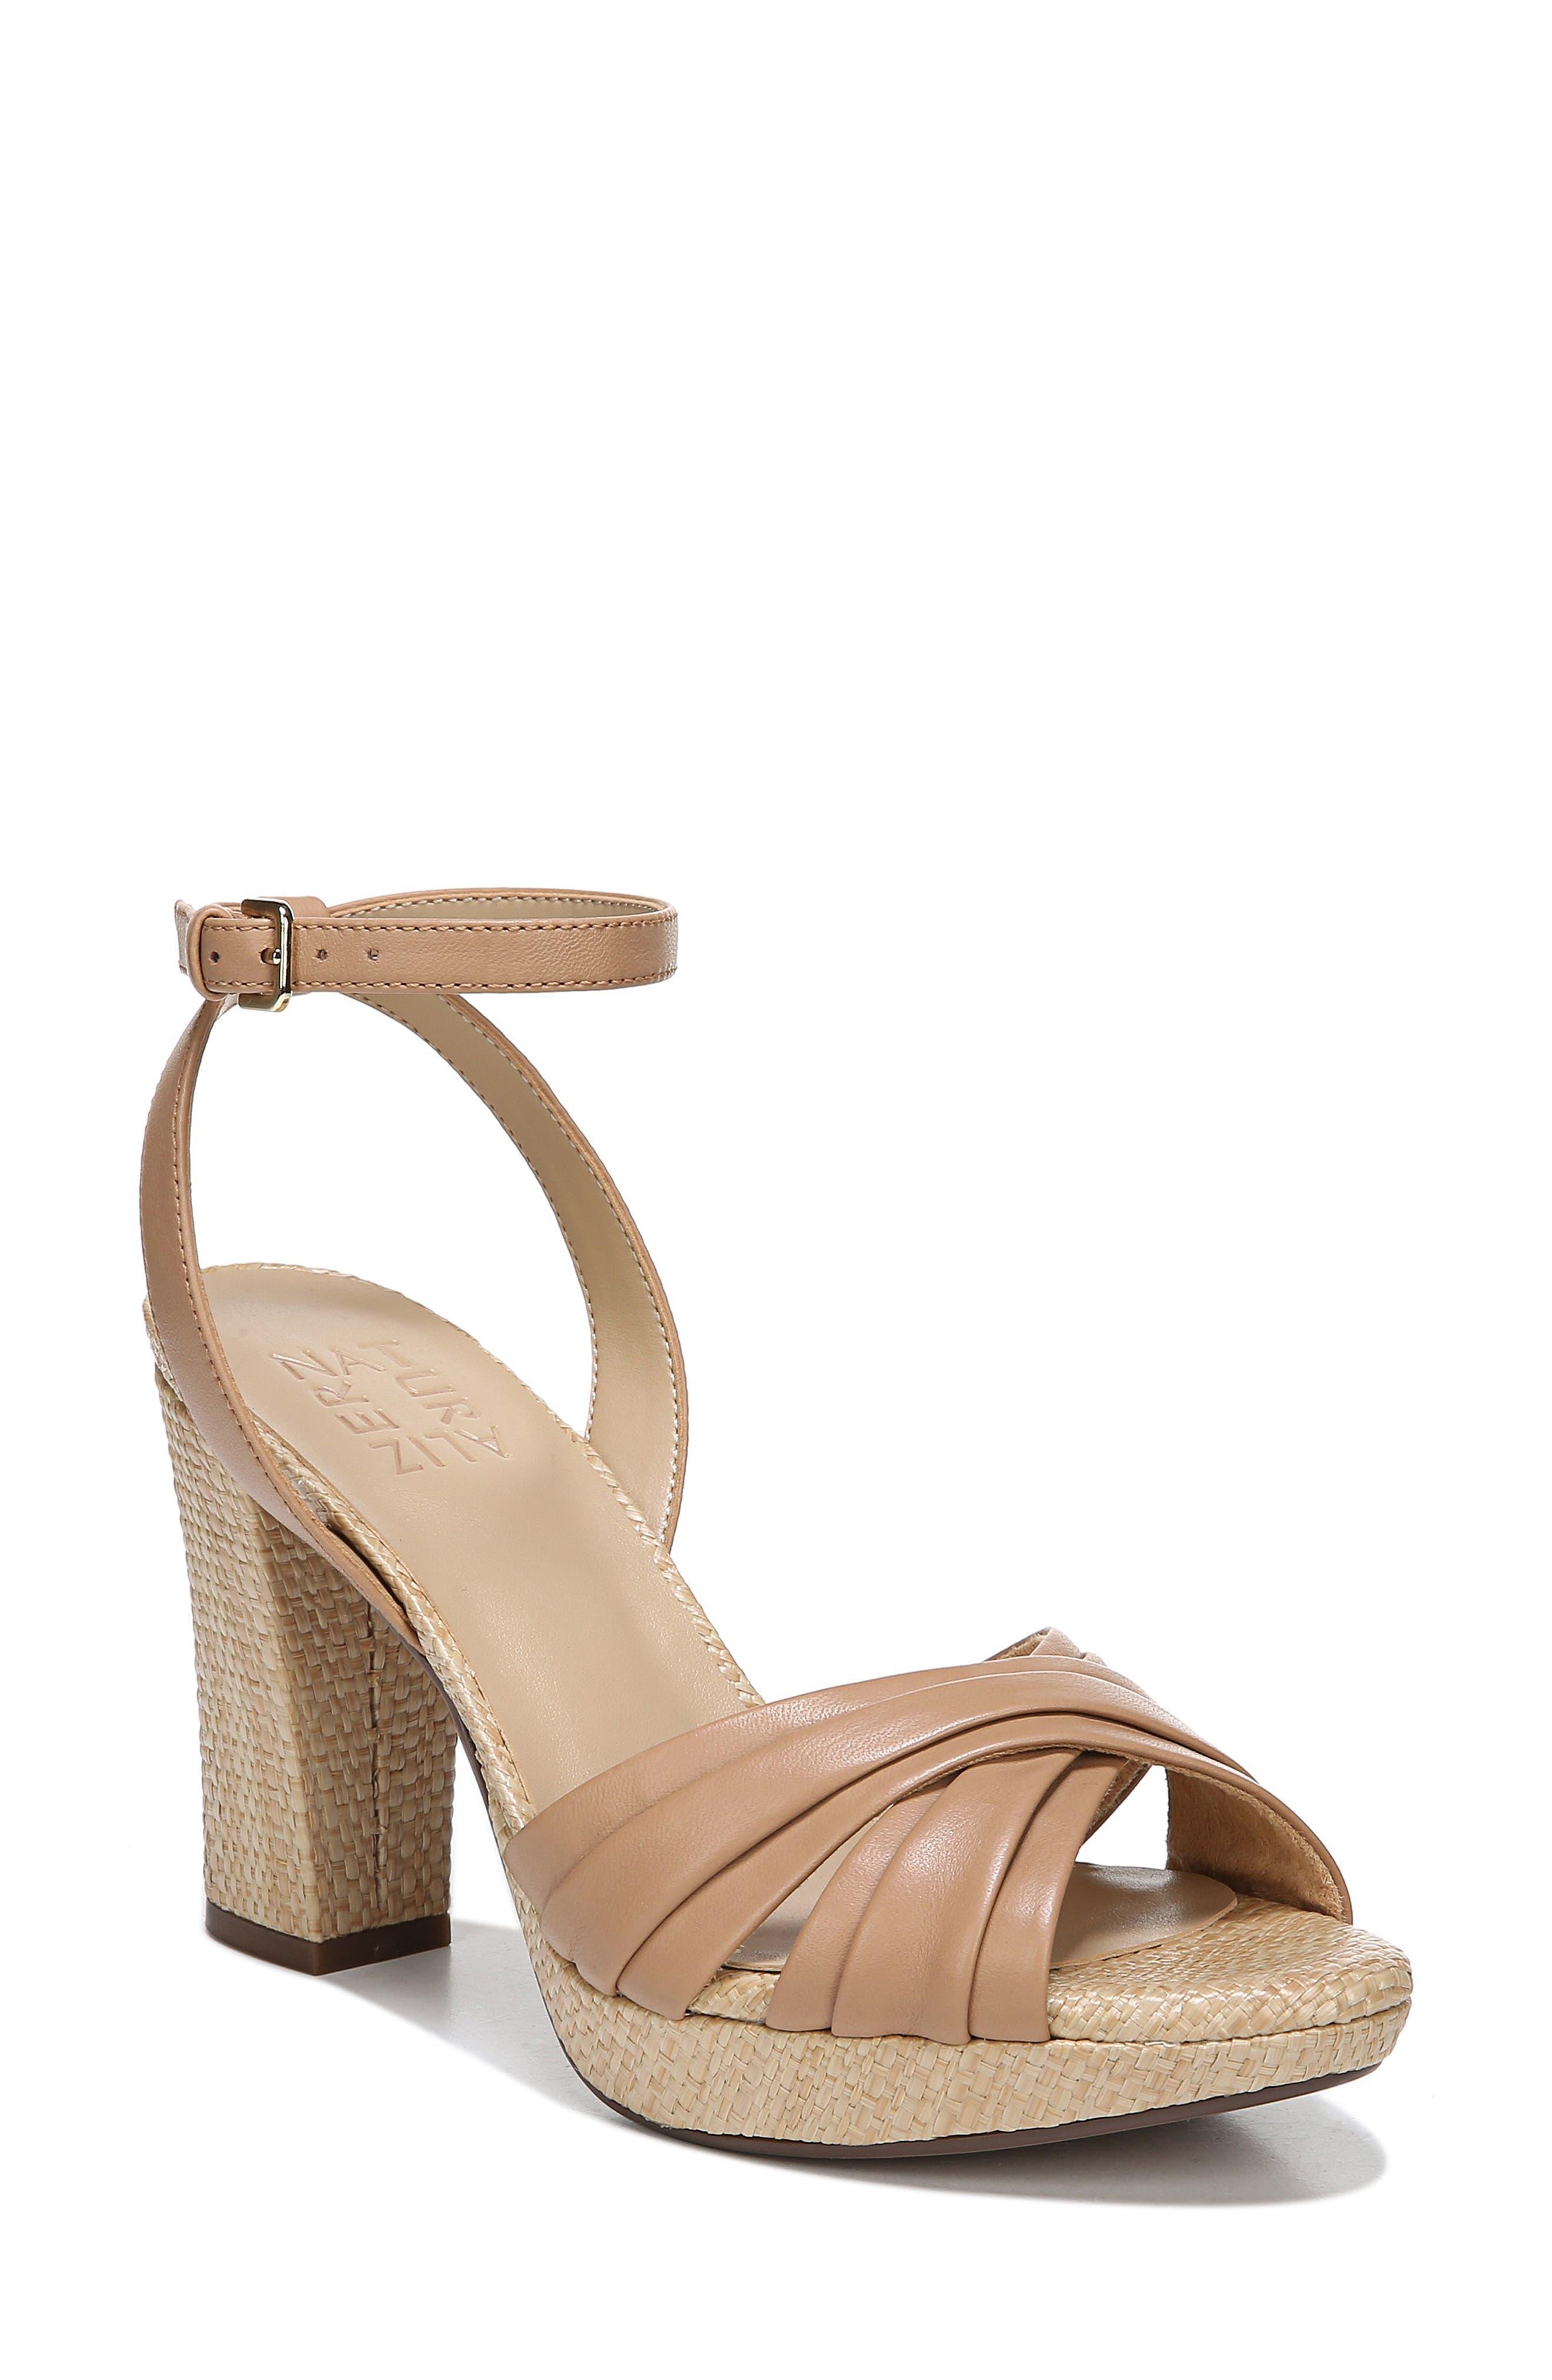 Naturalizer Avril Ankle Strap Sandal- Brown